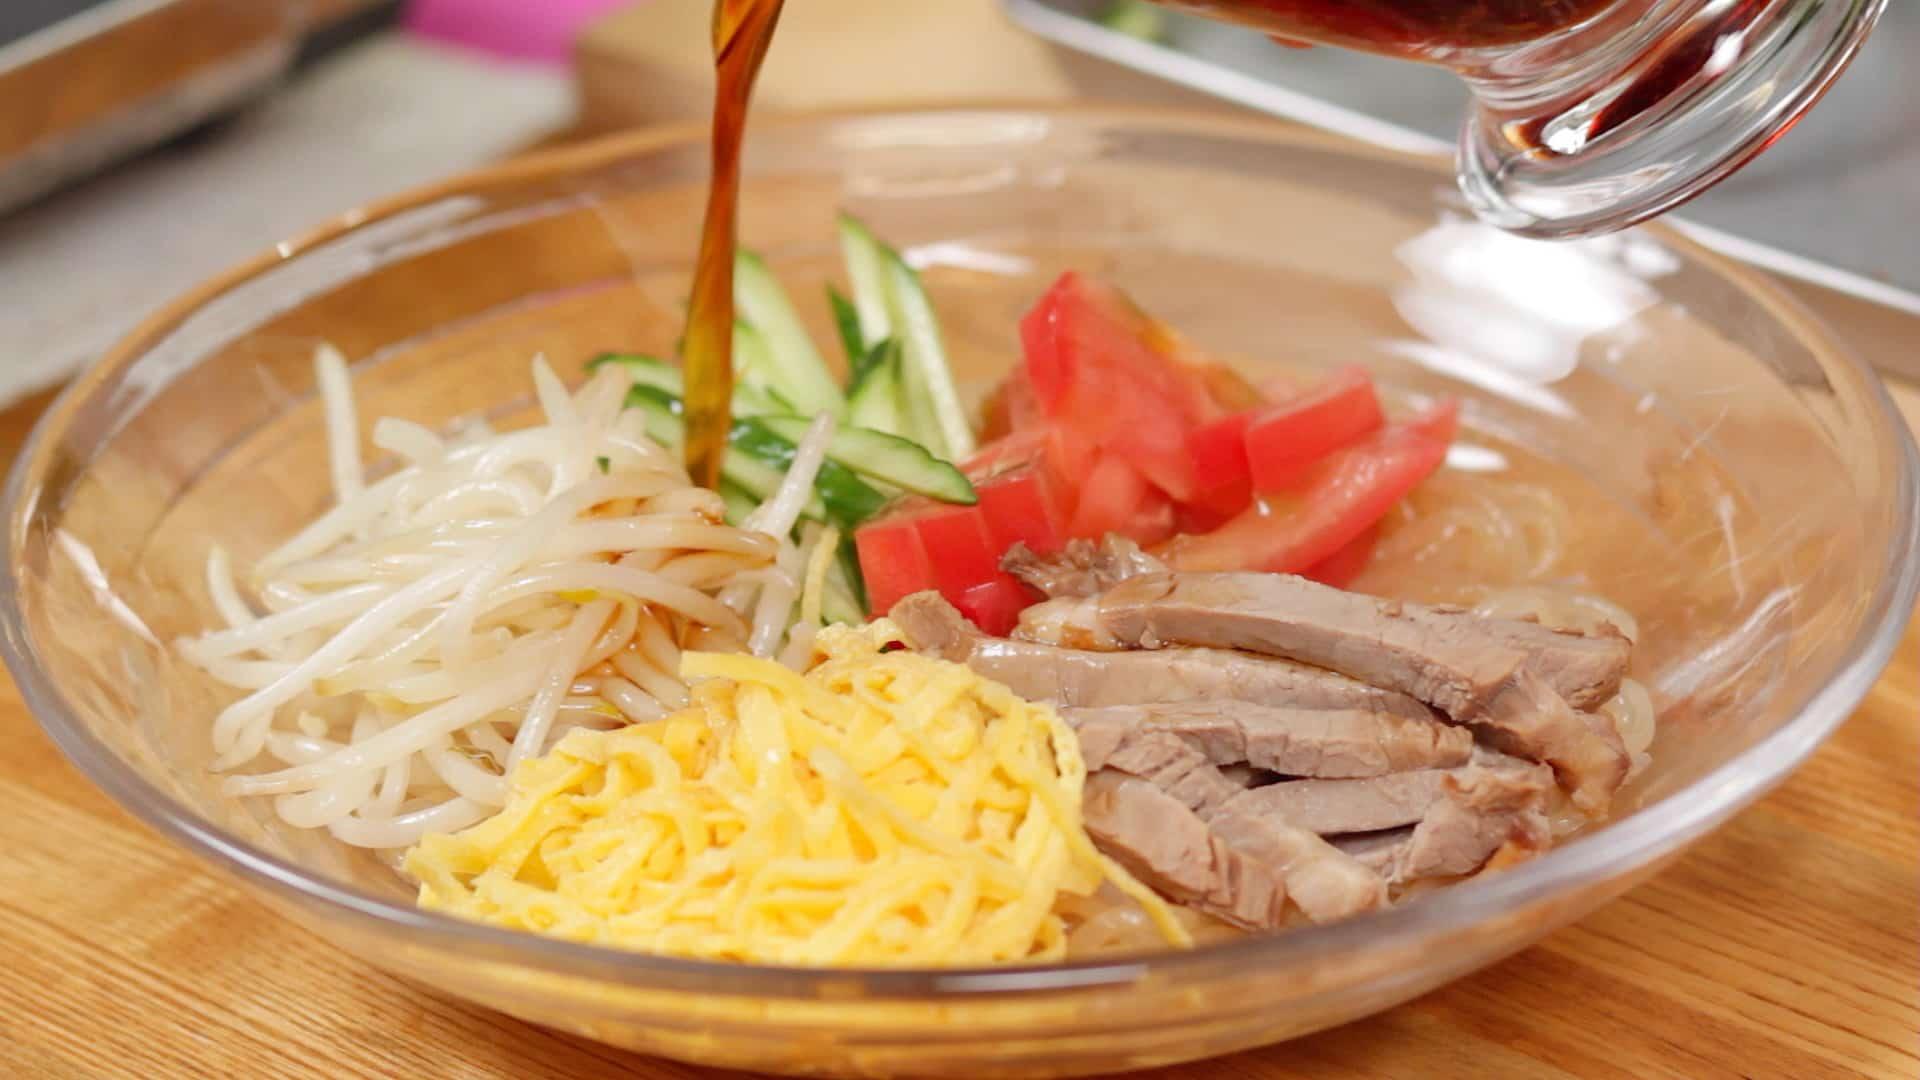 Hiyashi Chuka With Shirataki Noodles Recipe Low Calorie Watermelon Wallpaper Rainbow Find Free HD for Desktop [freshlhys.tk]